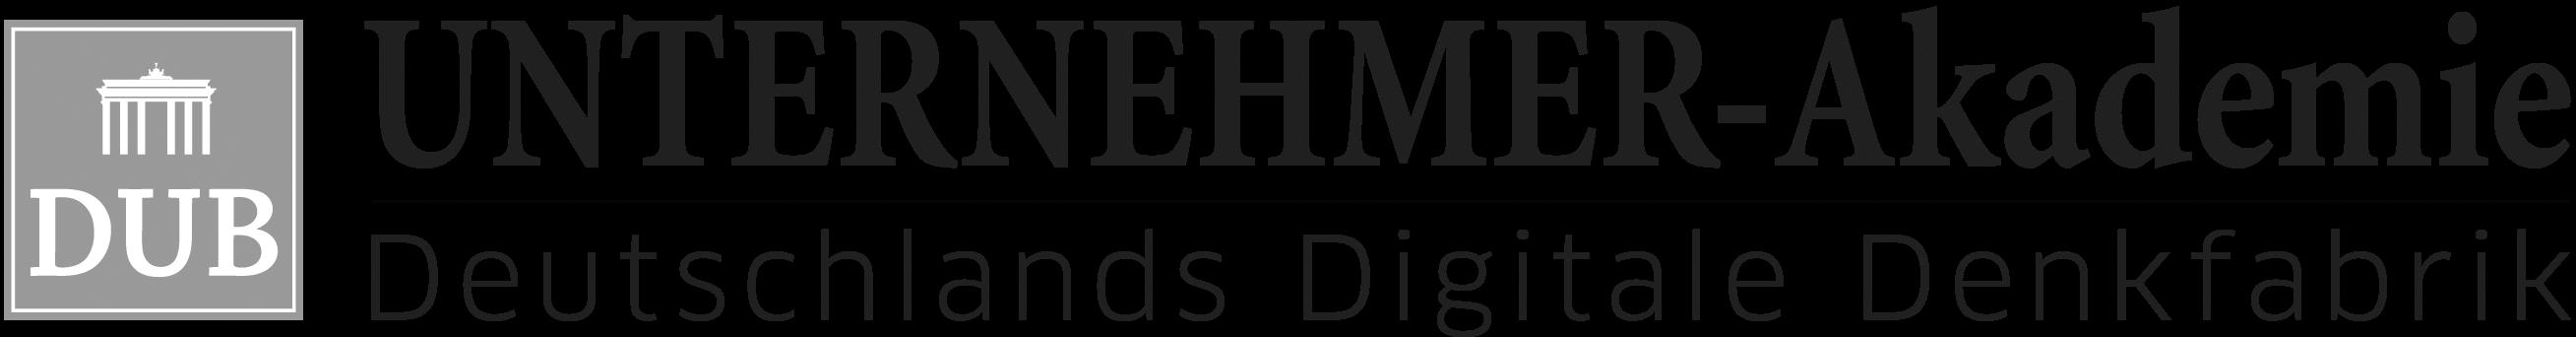 dub-logo-unternehmer-akademie_grau